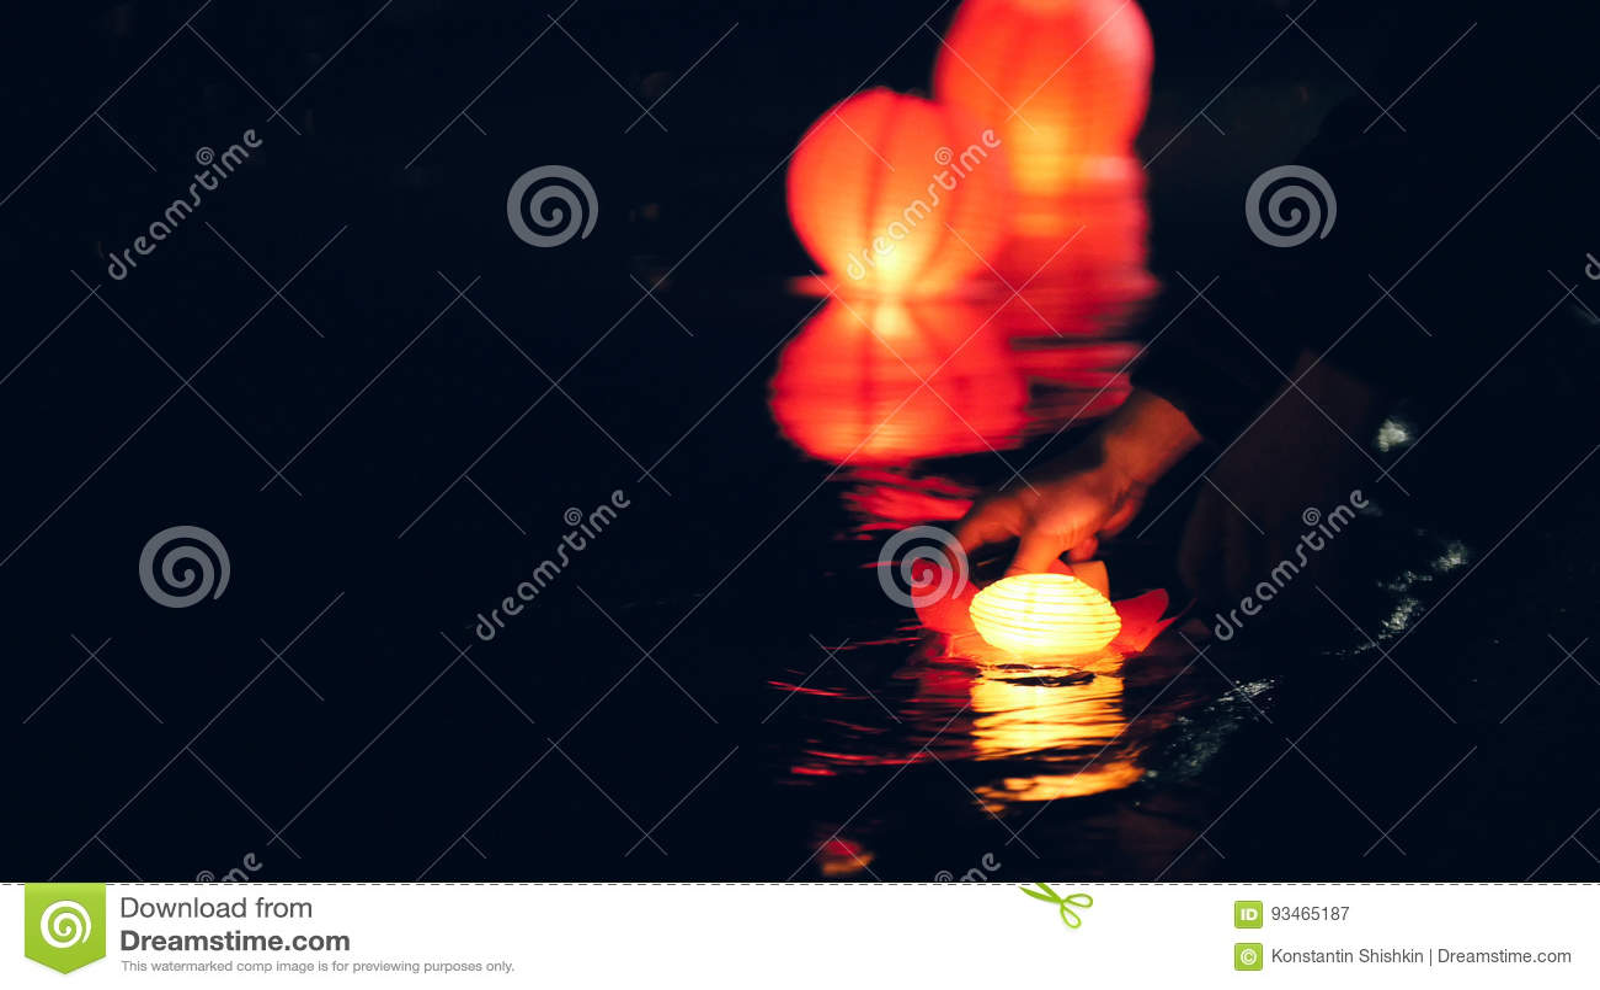 Lighting floating lighting Lanterns on river at night - romantic festival